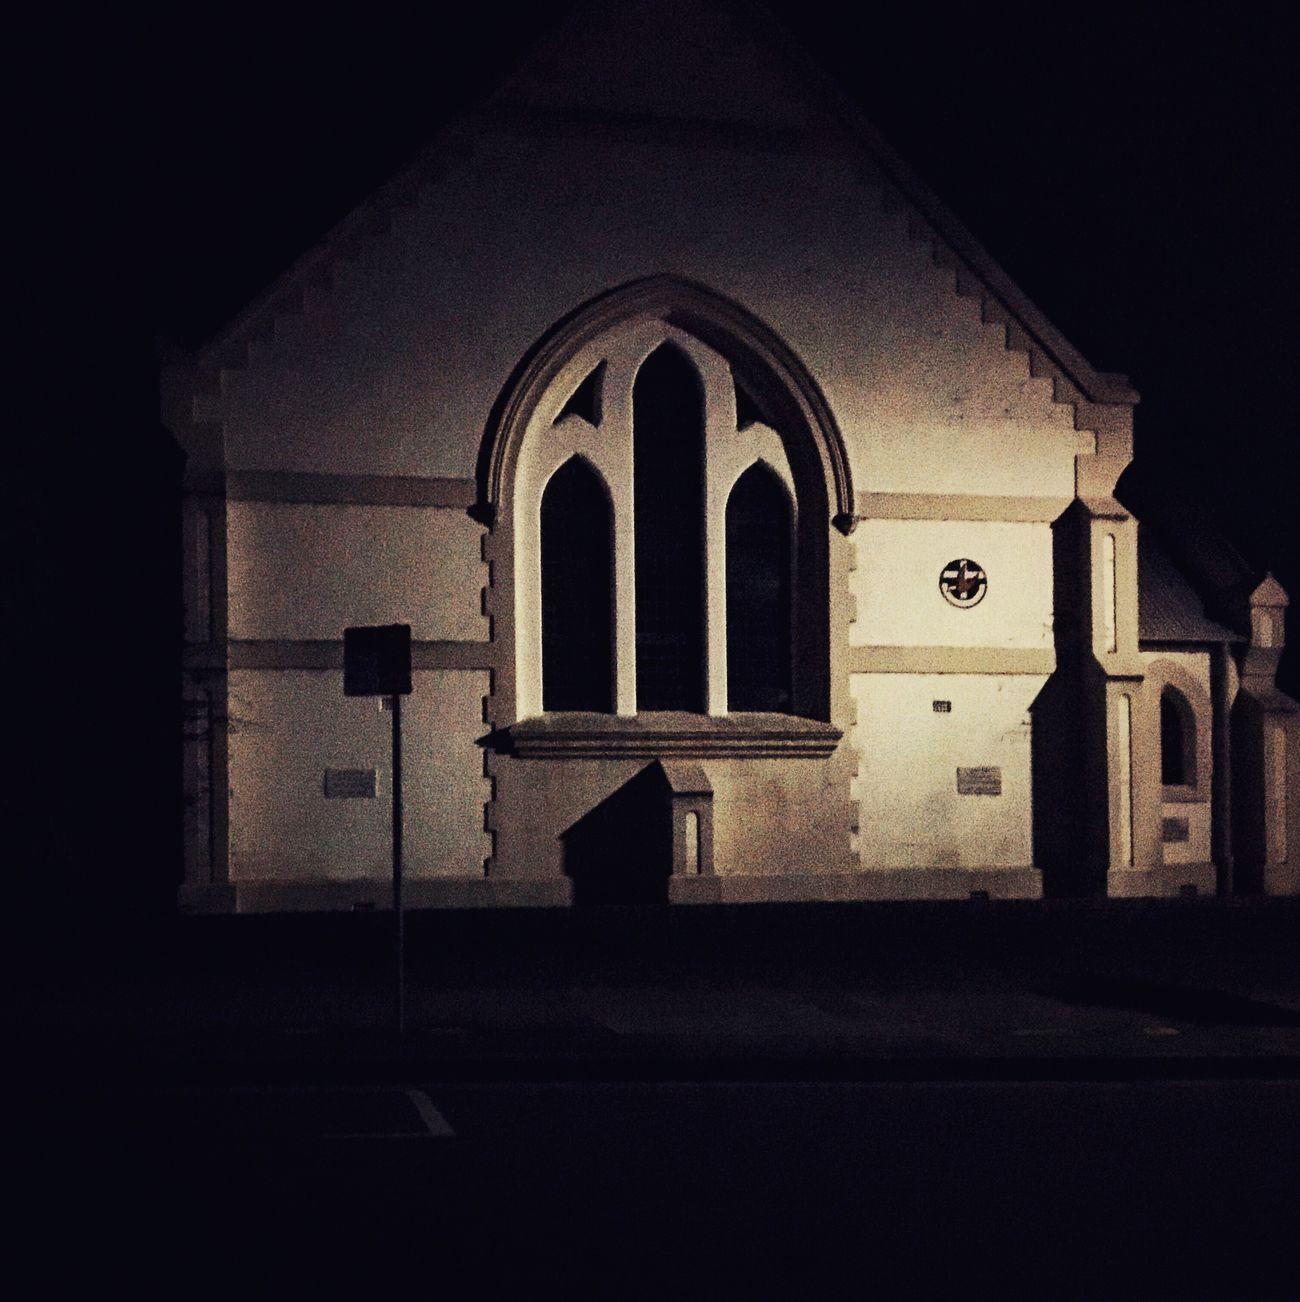 Sydney Iphoneography Nightphotography Vscofilm